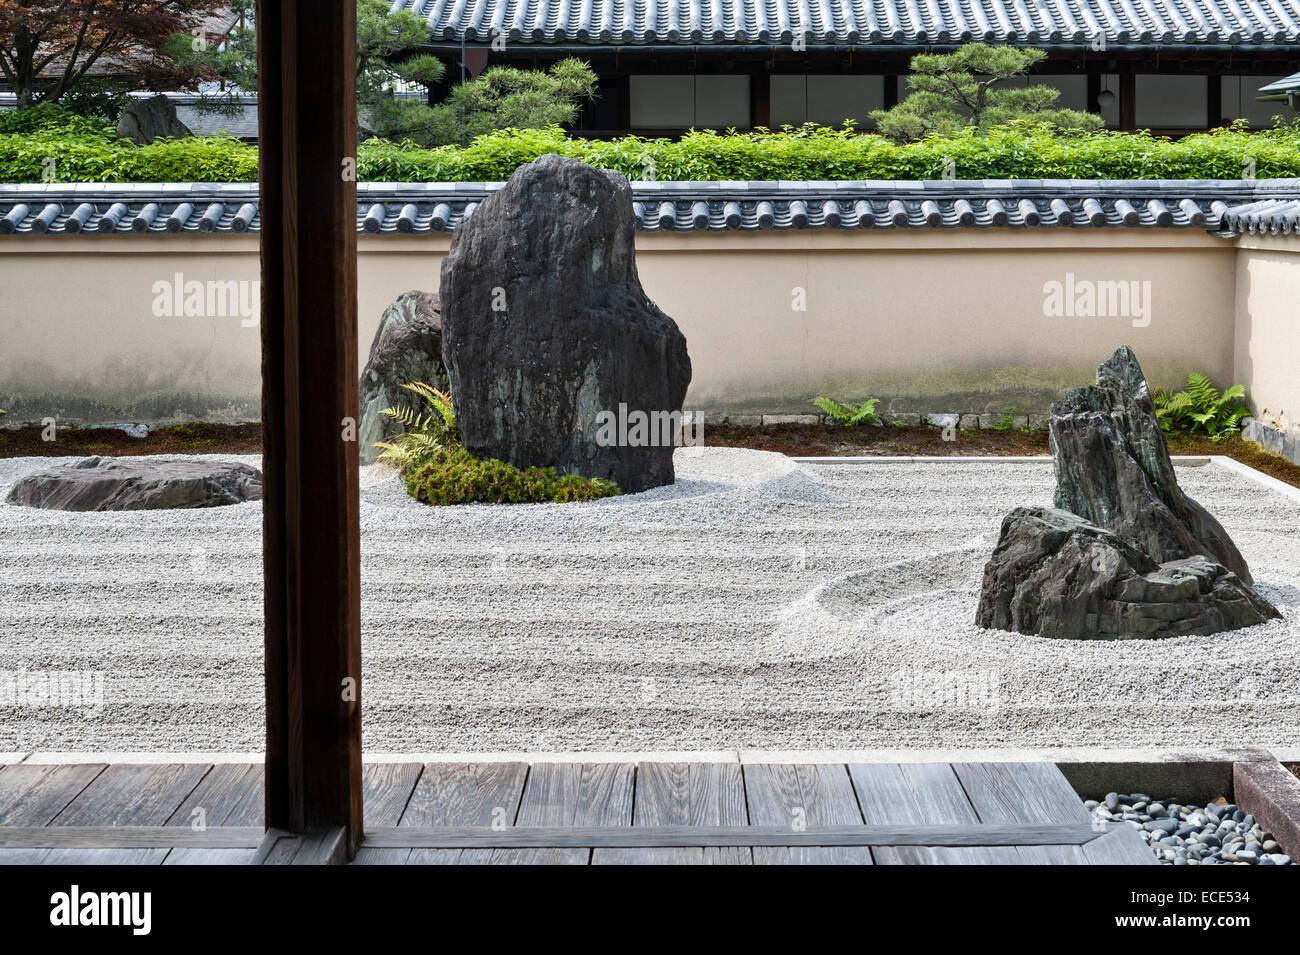 Ryogen-in Temple, Daitoku-ji, Kyoto, Japan. The Mt Horai stone in the Isshidan garden, with the 'crane island' - Stock Image